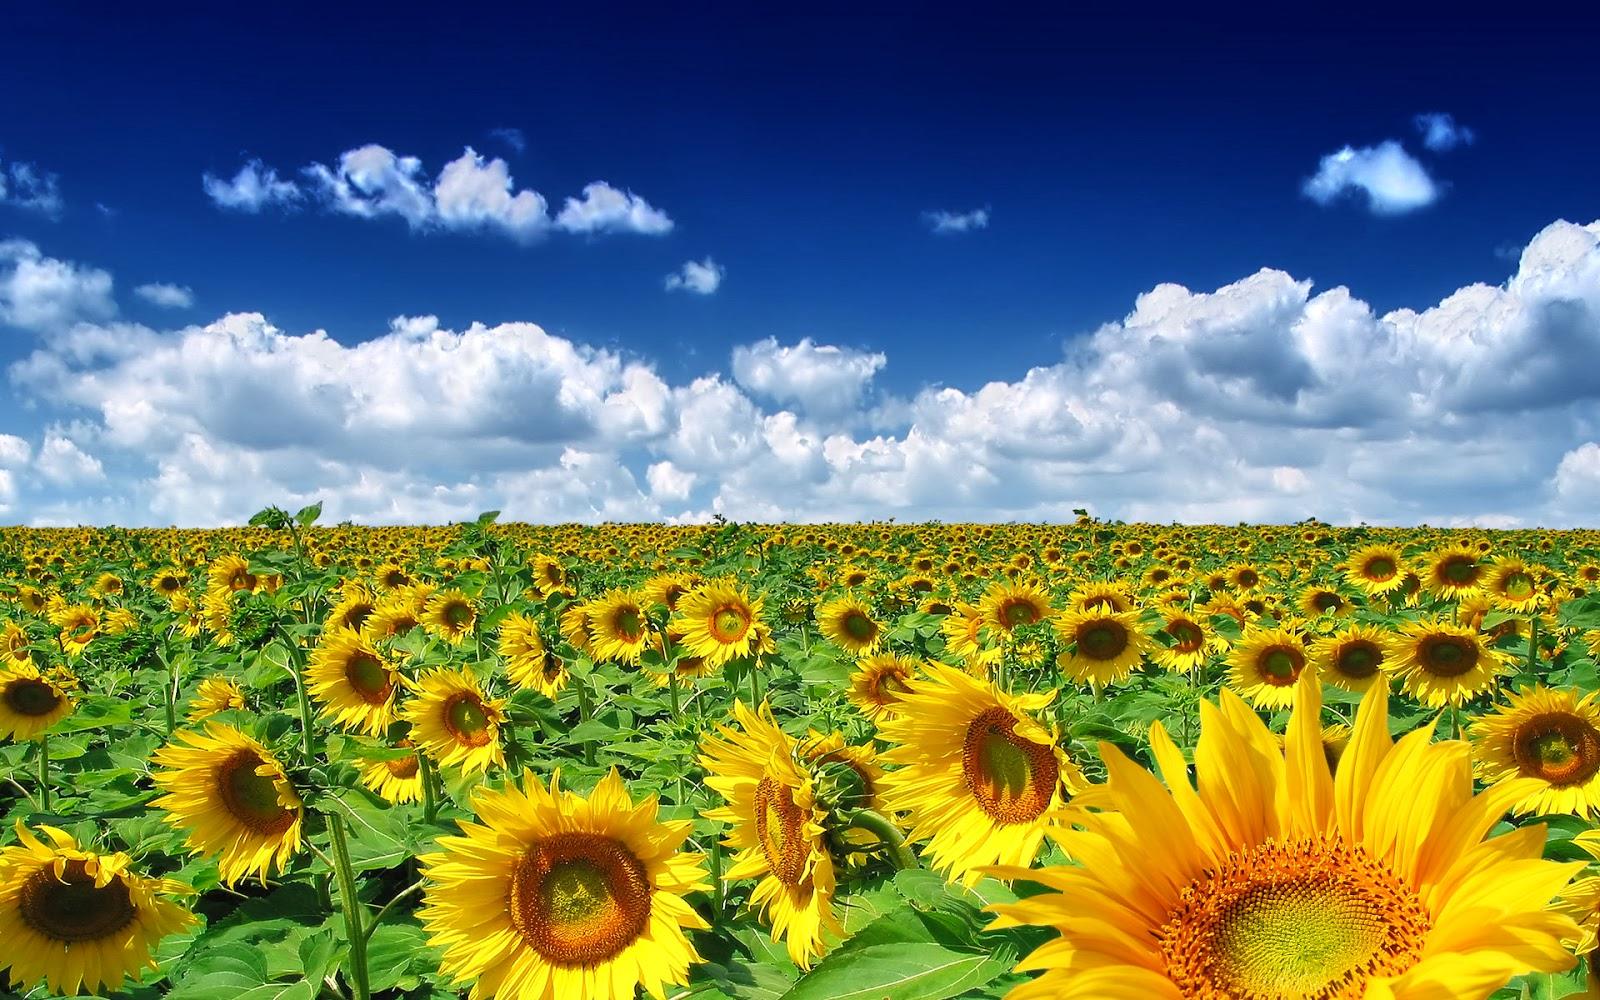 Desktop Background Sunflowers - HD Wallpaper